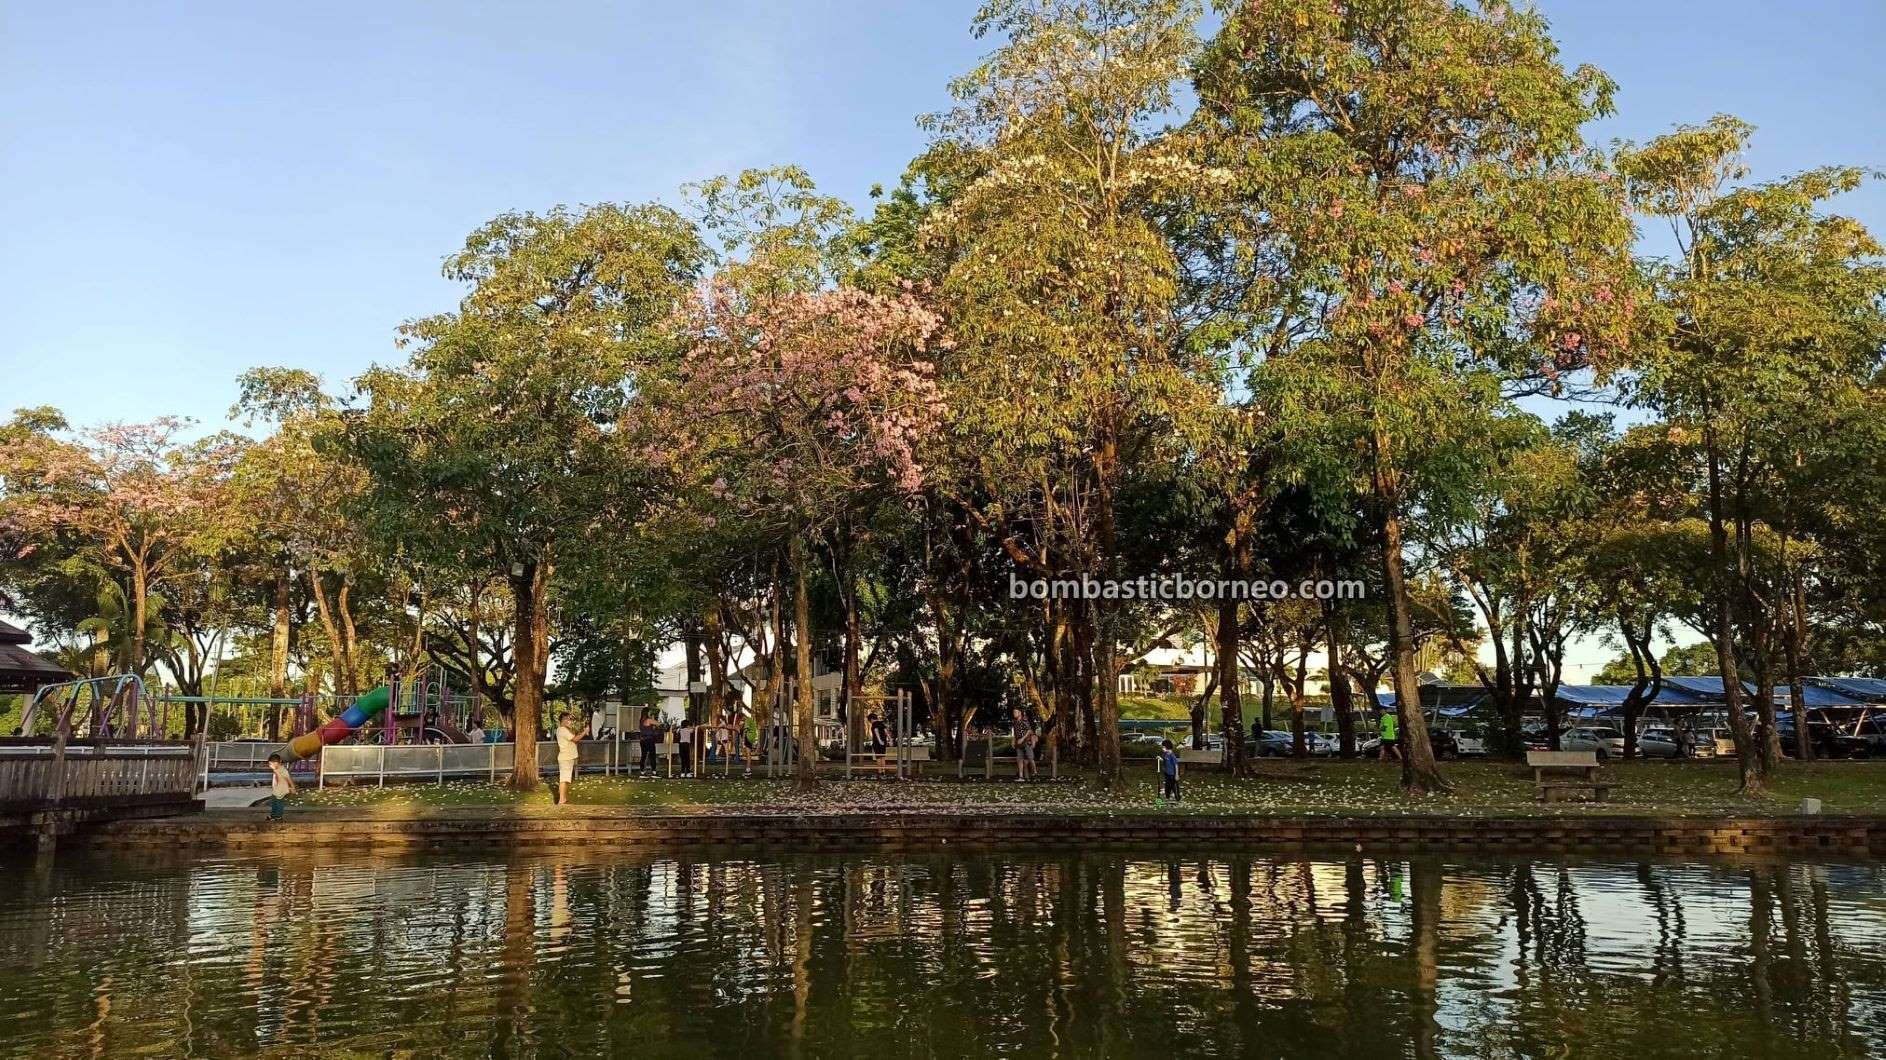 destination, nature, outdoor, exercise, garden, jogging, Park, tempat senaman, Malaysia, Tourism, tourist attraction, travel local, 探索婆罗洲游踪, 马来西亚砂拉越, 古晋南市运动公园,